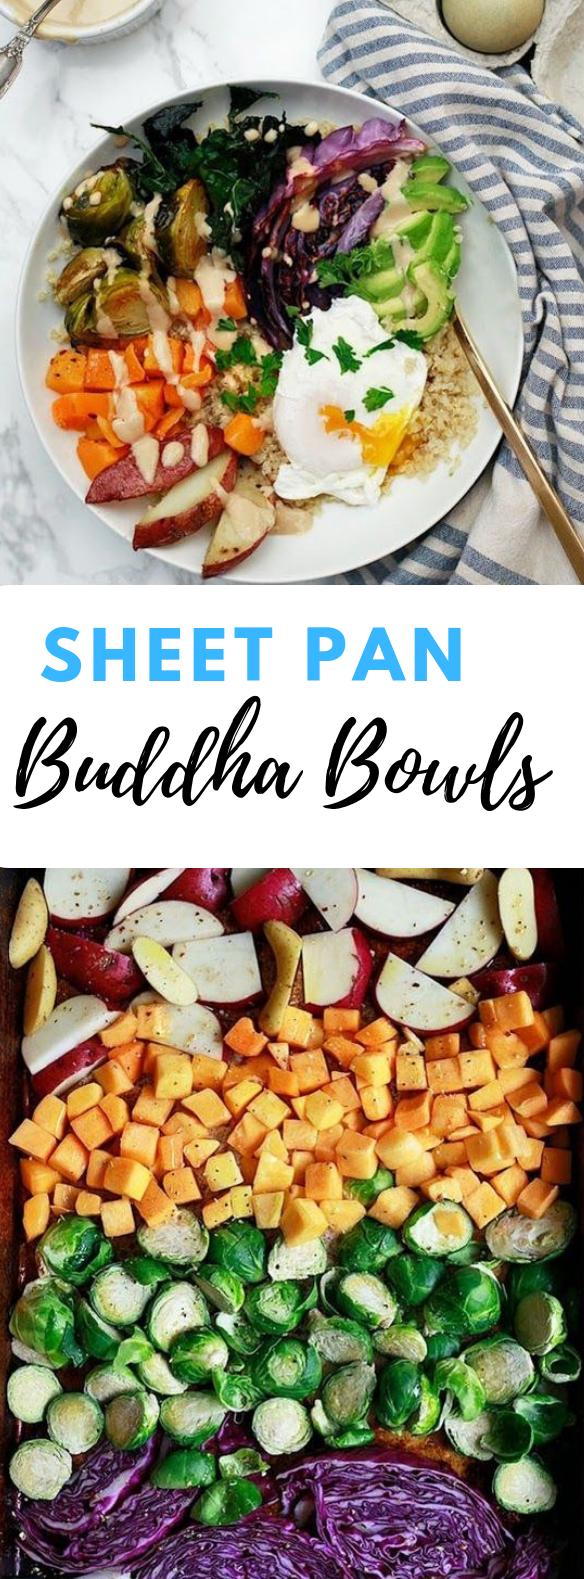 SHEET PAN BUDDHA BOWLS  #healthydiet #delicious